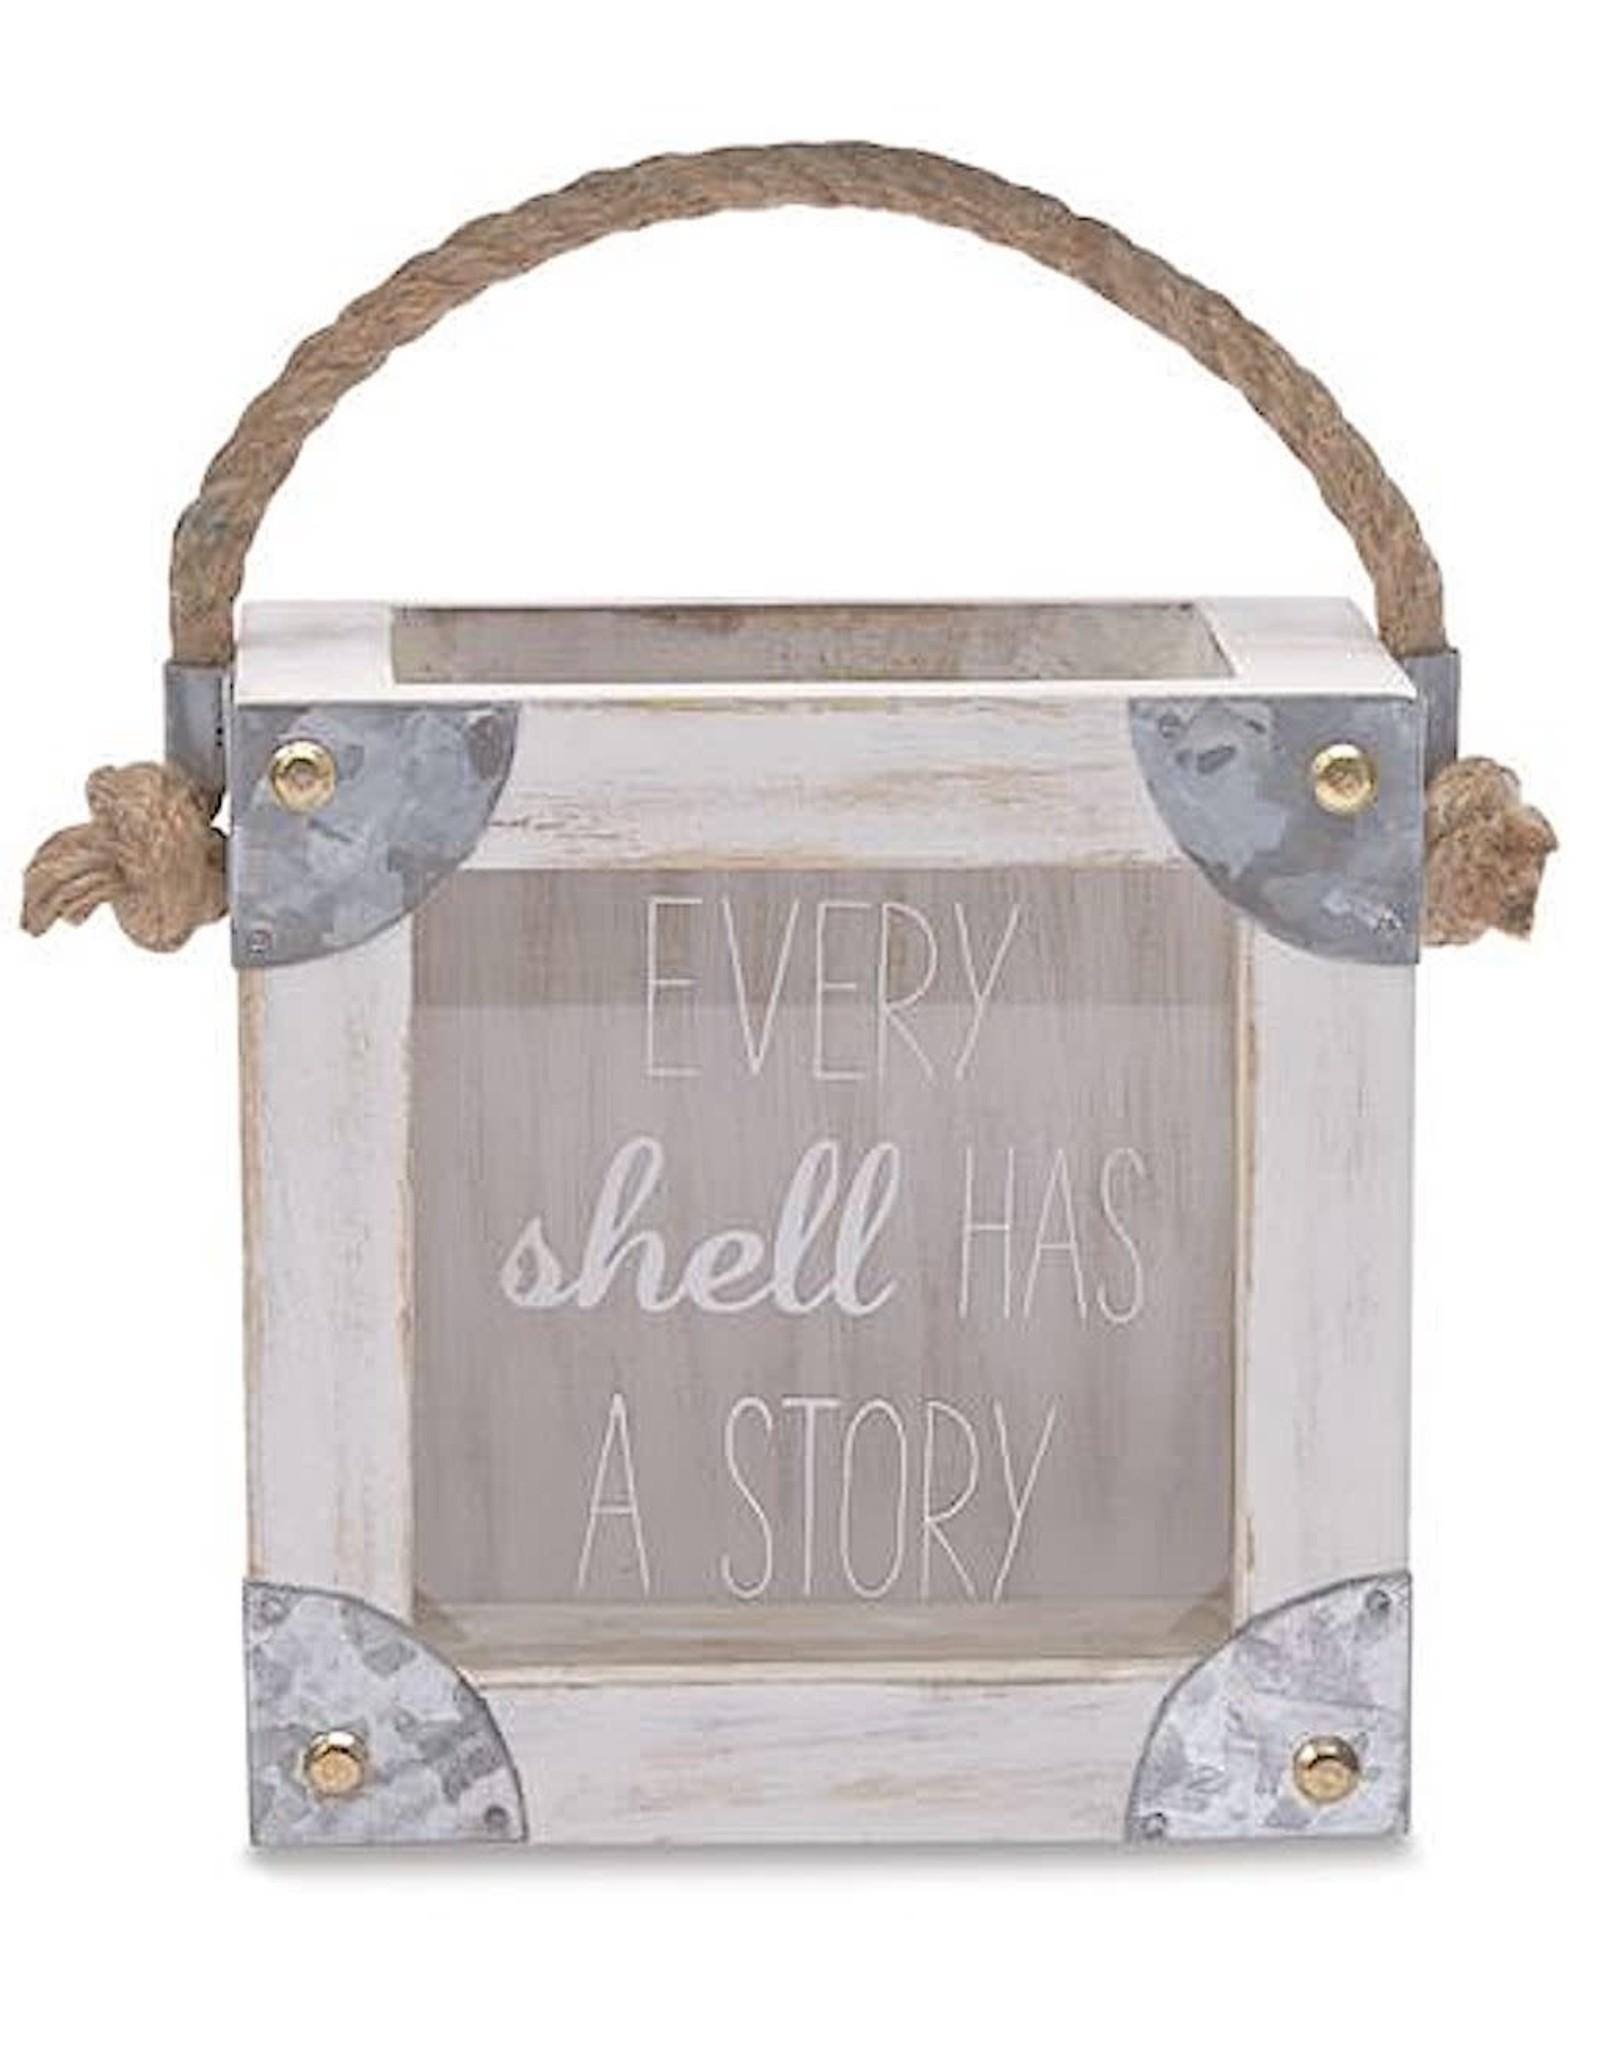 Every Shell Box